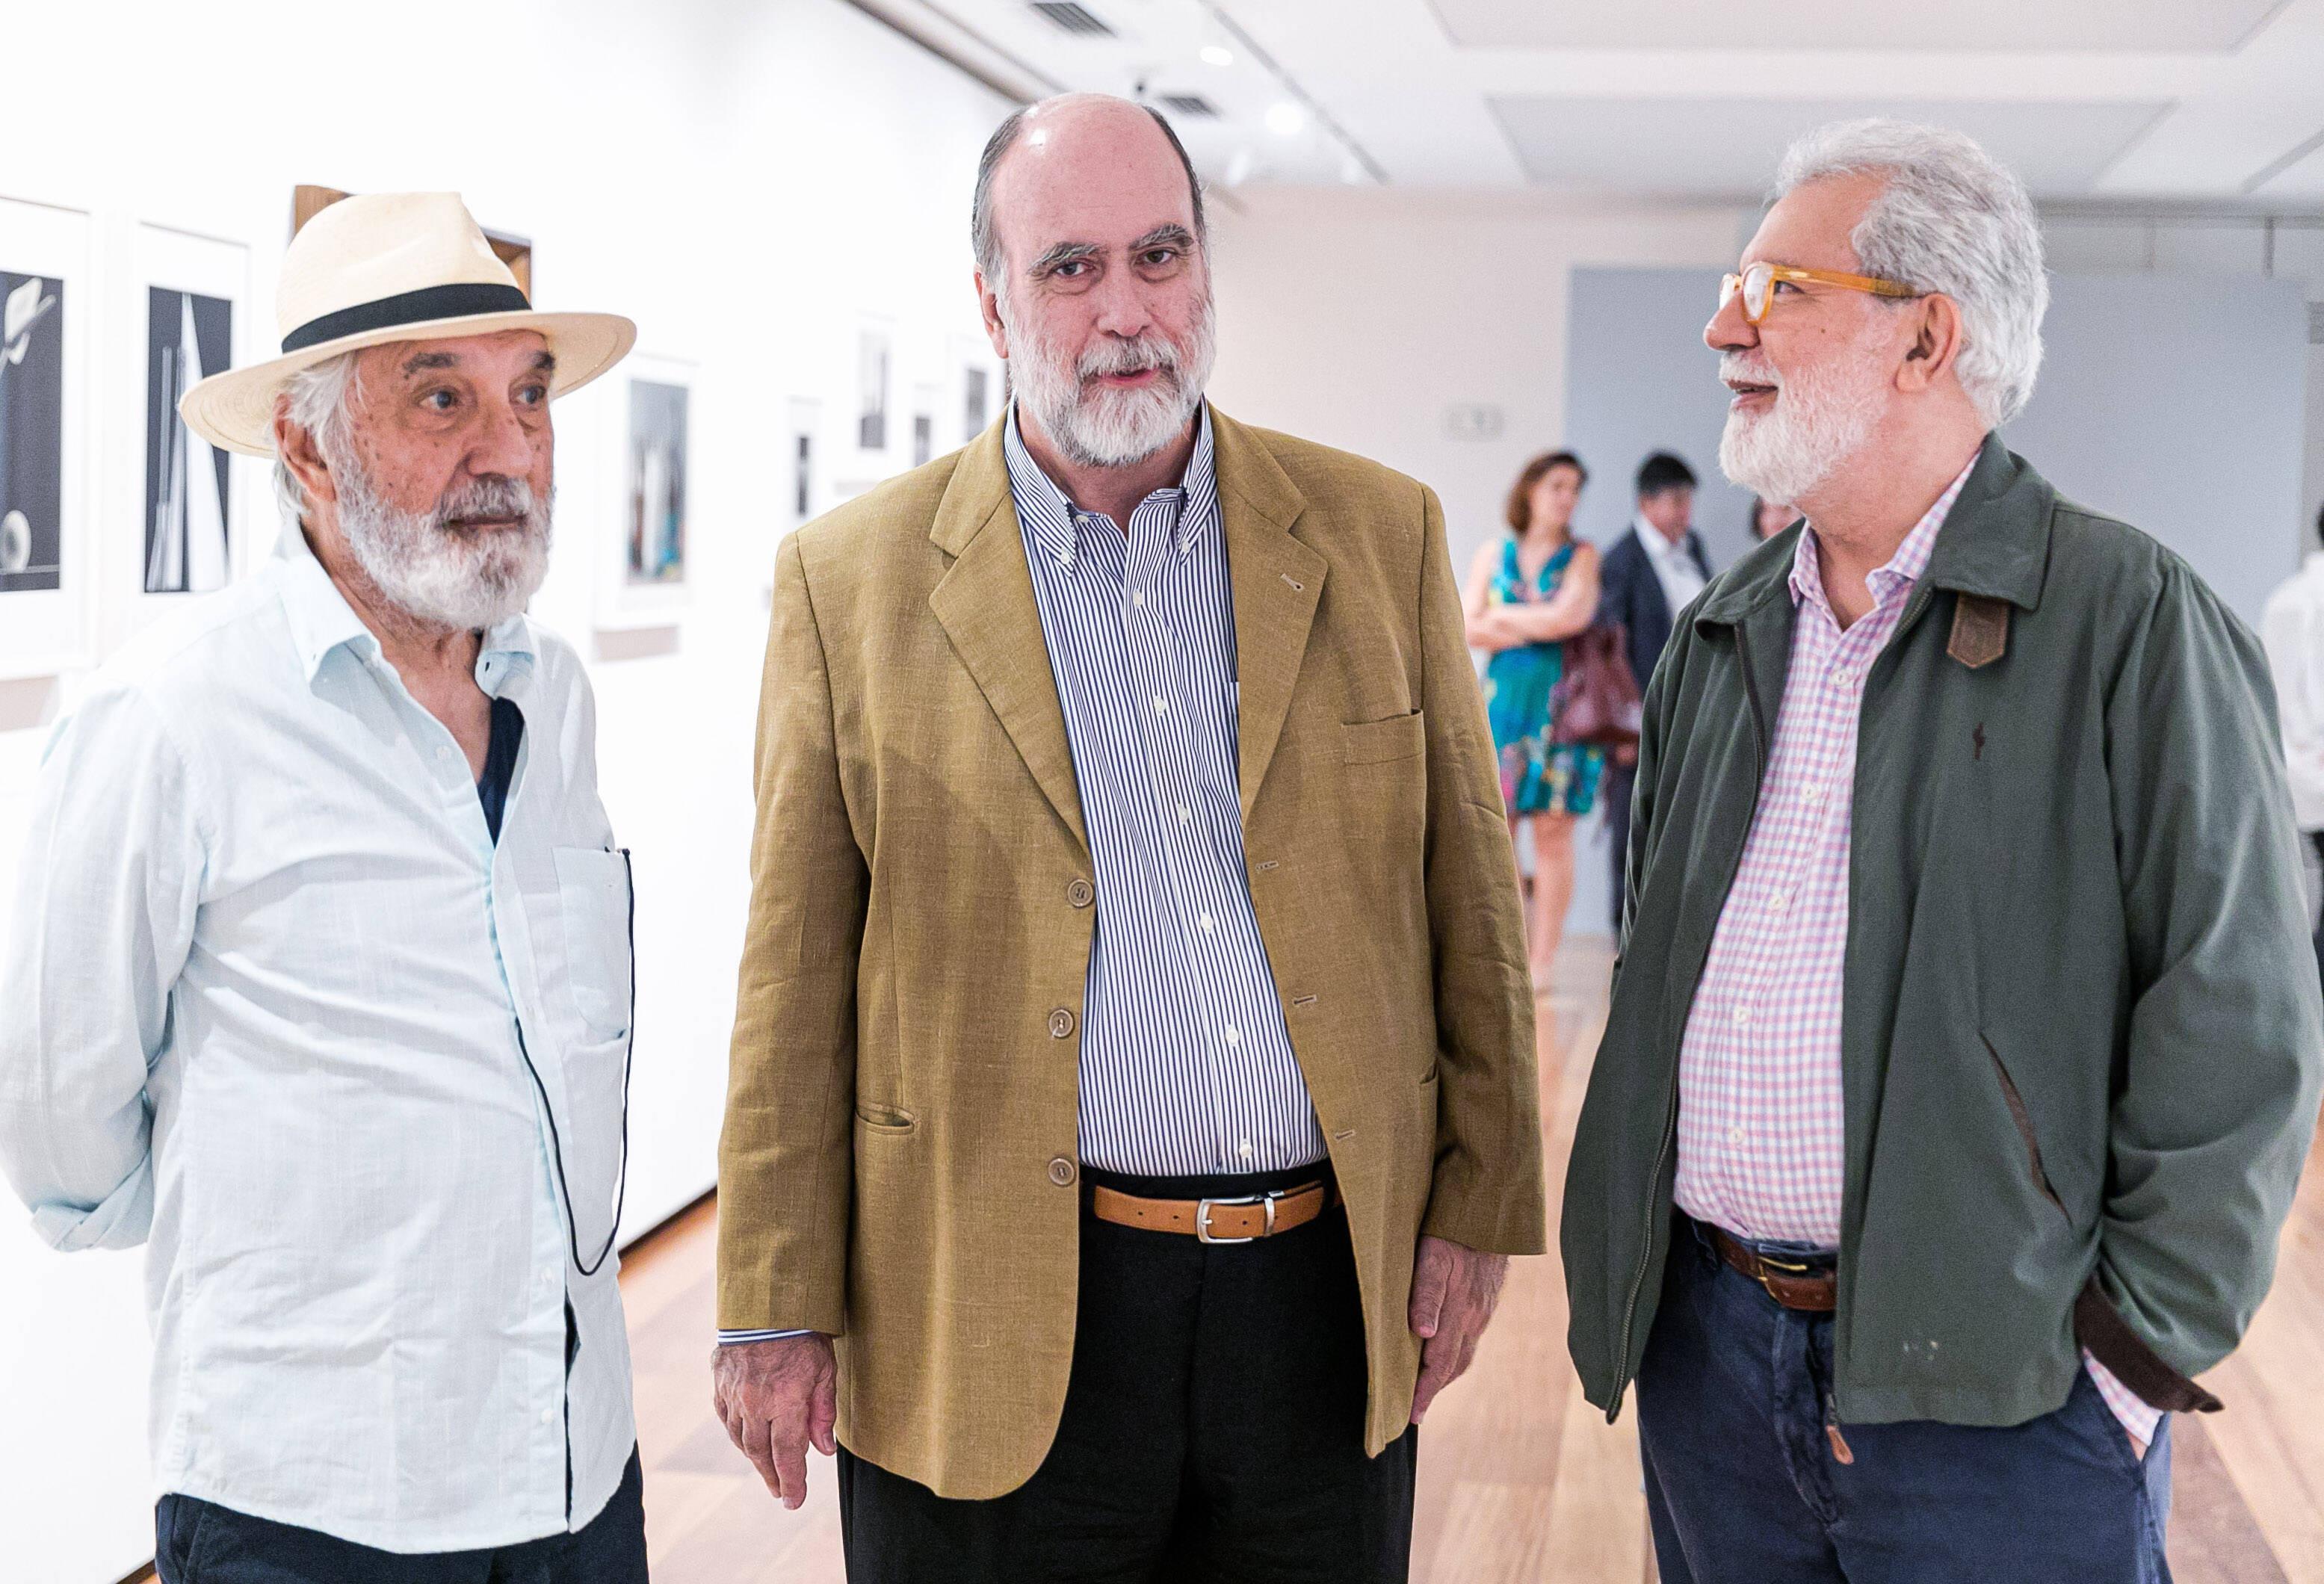 Glauco Campello, Vitor Botton e Glaucio Campelo / Foto: Miguel Sá